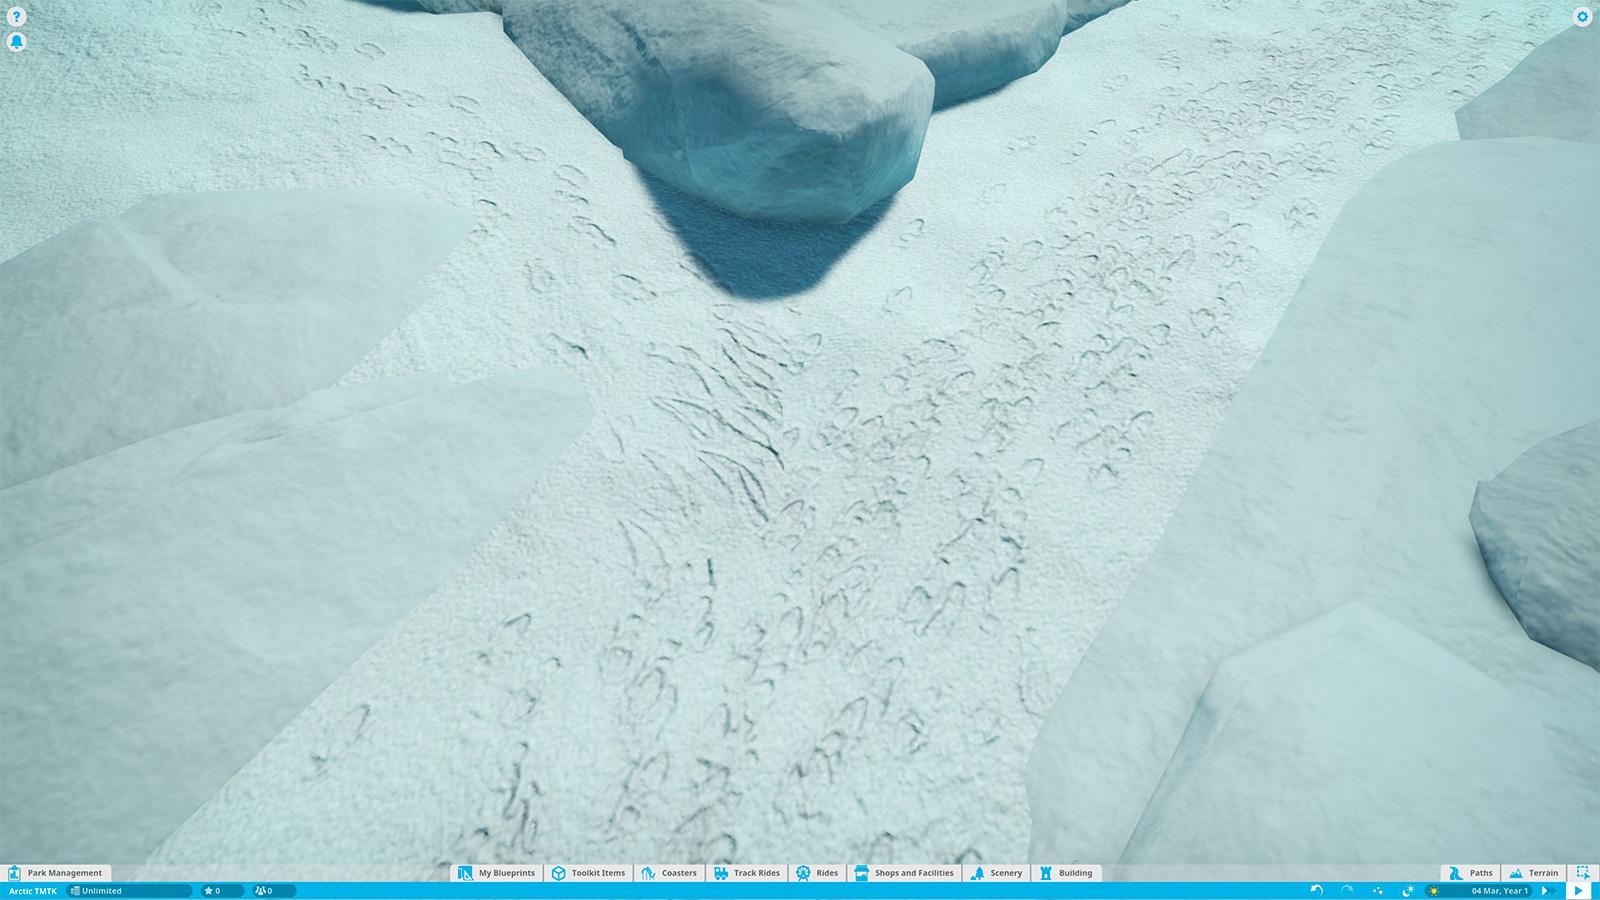 PlanCo-QVP-Screenshots-BatchA-0139.jpg